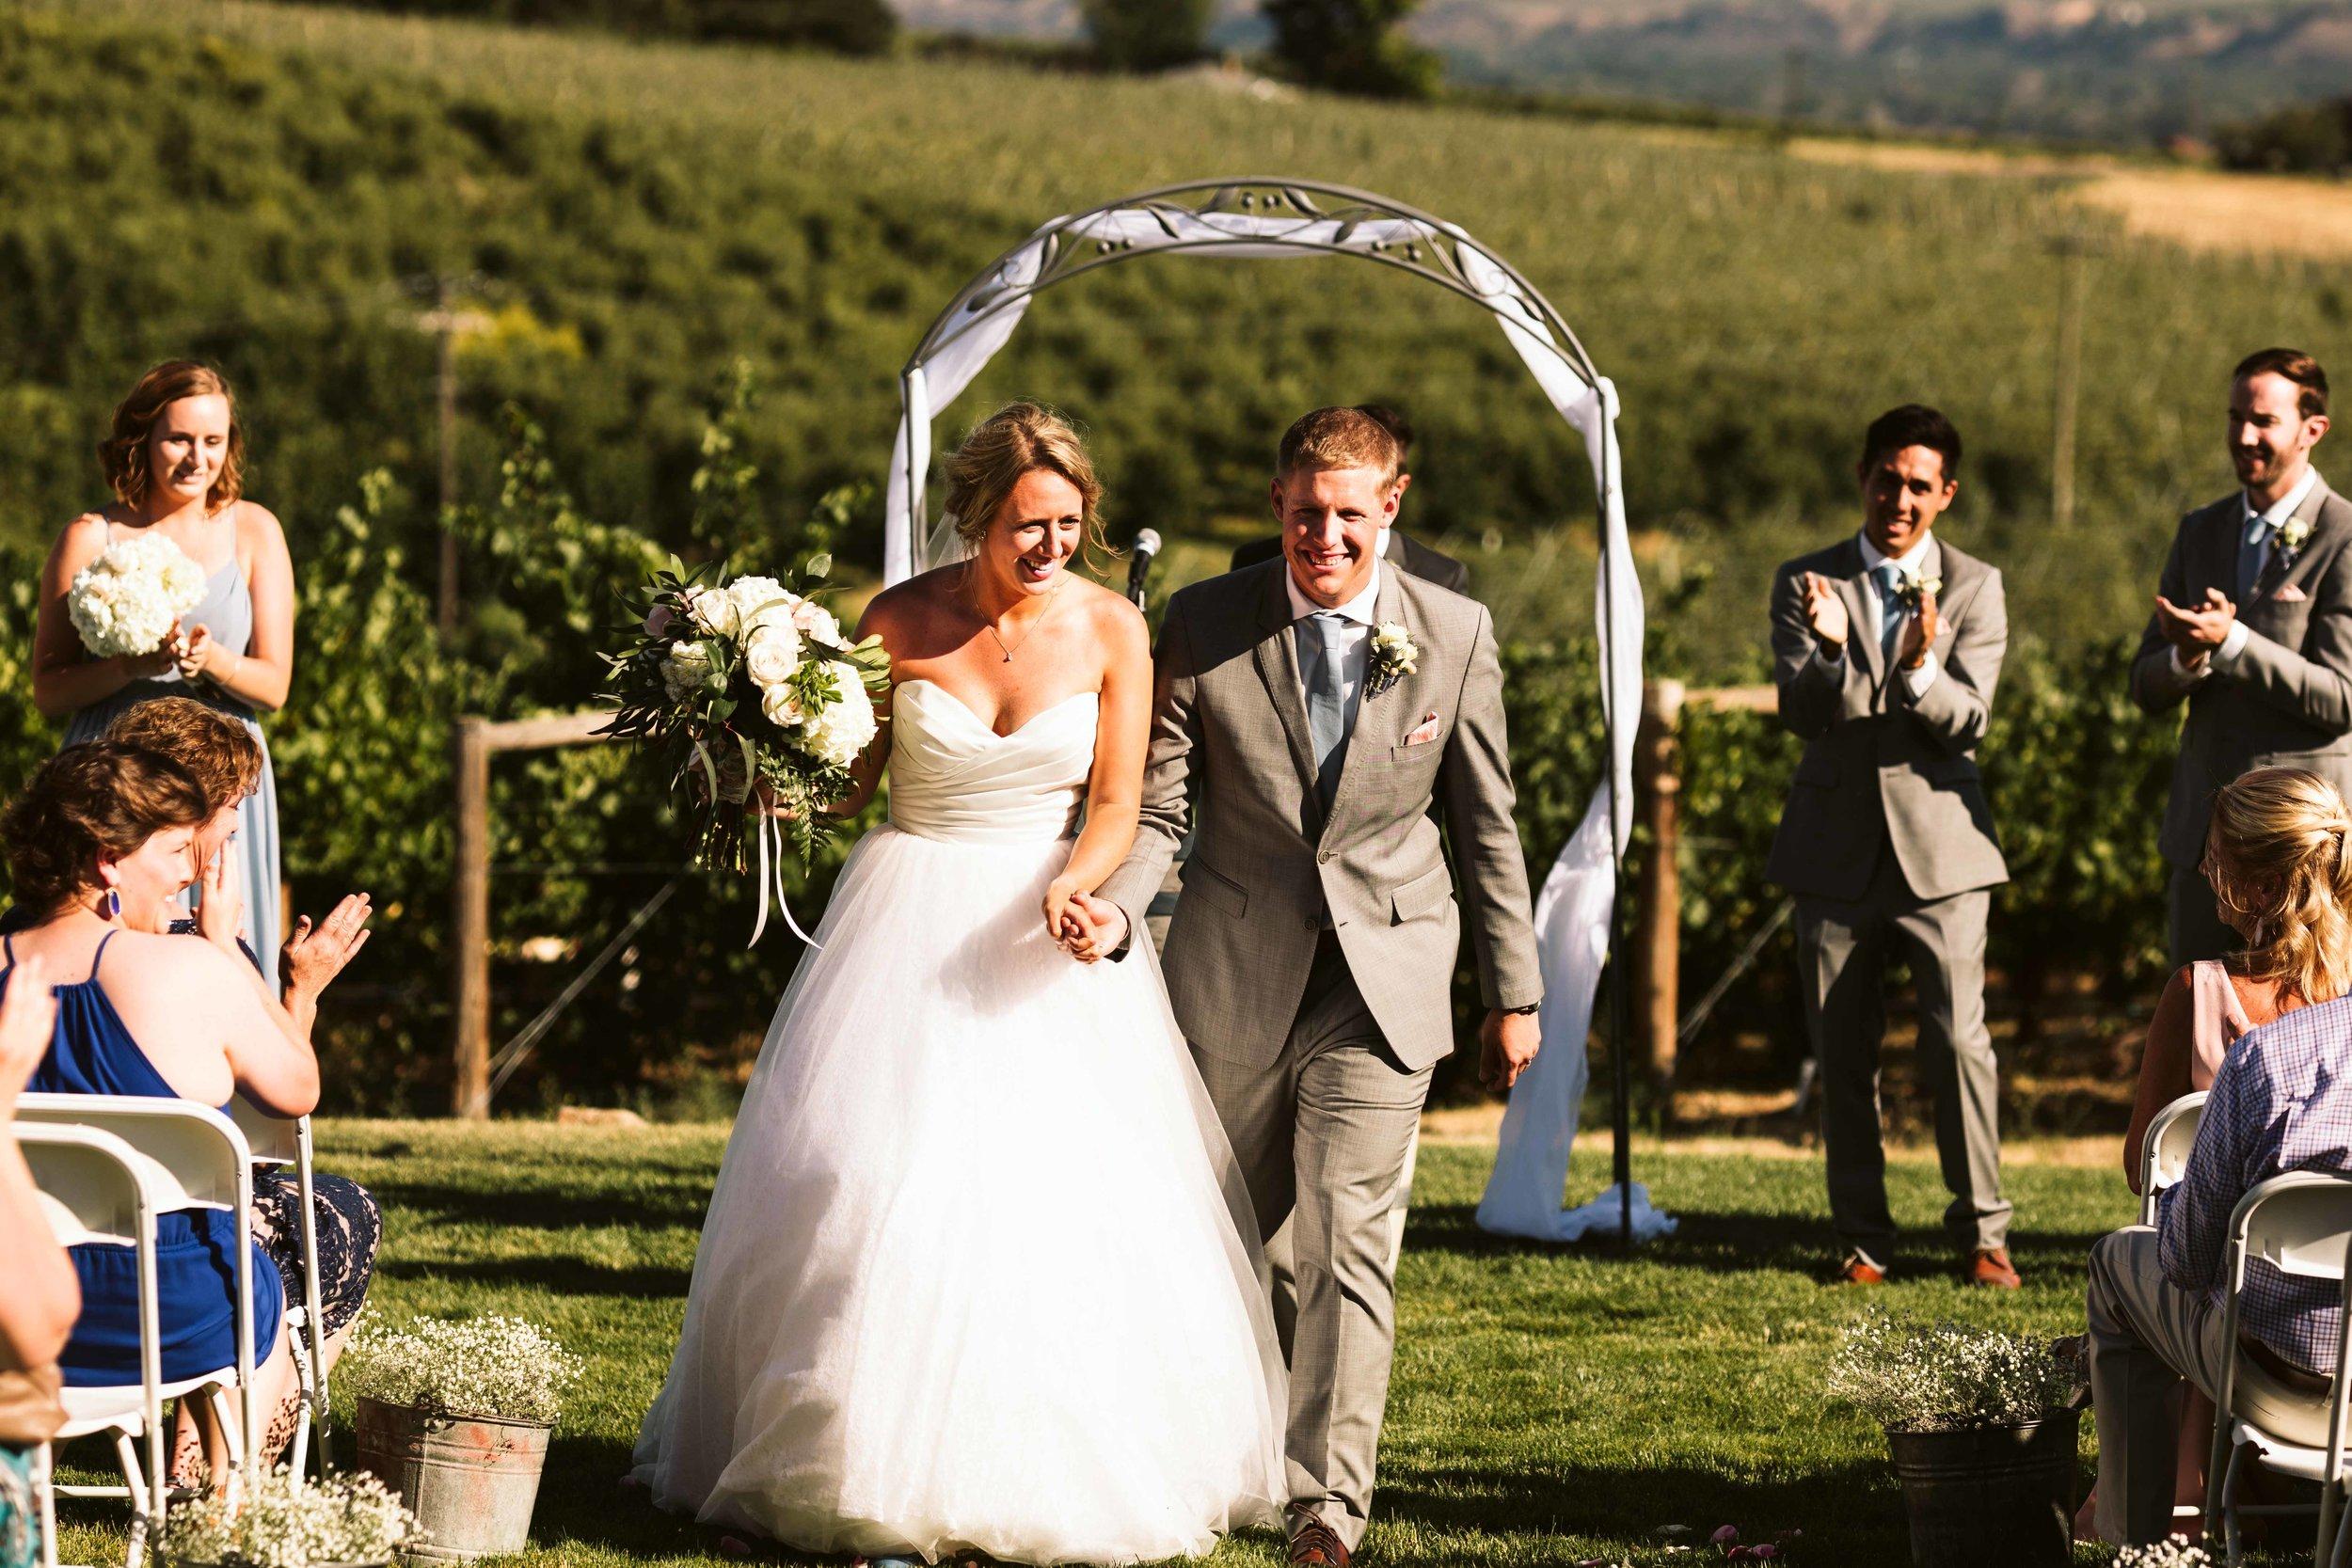 fontaine-estates-wedding-73.jpg